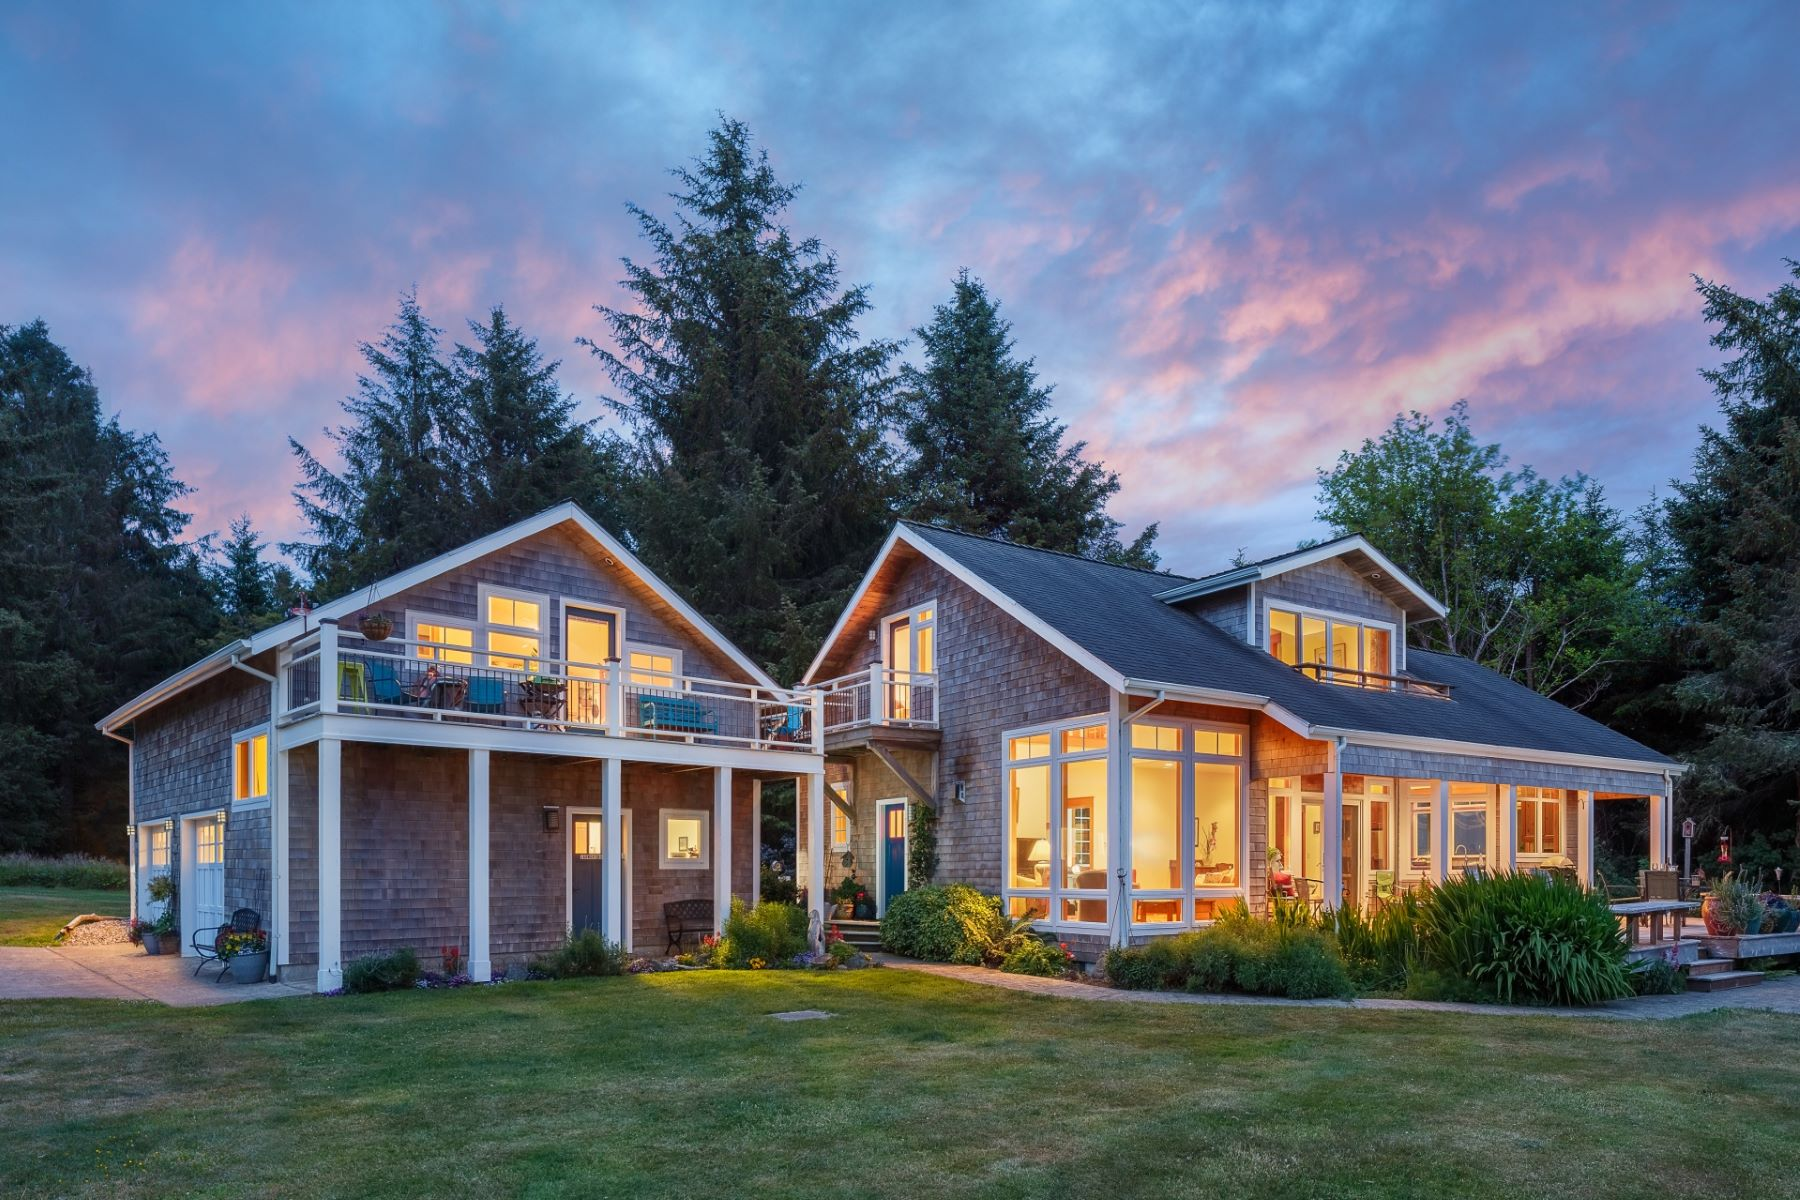 Single Family Homes for Active at Breathtaking Netarts Bayfront Home 6800 Whiskey Creek Road Netarts, Oregon 97143 United States